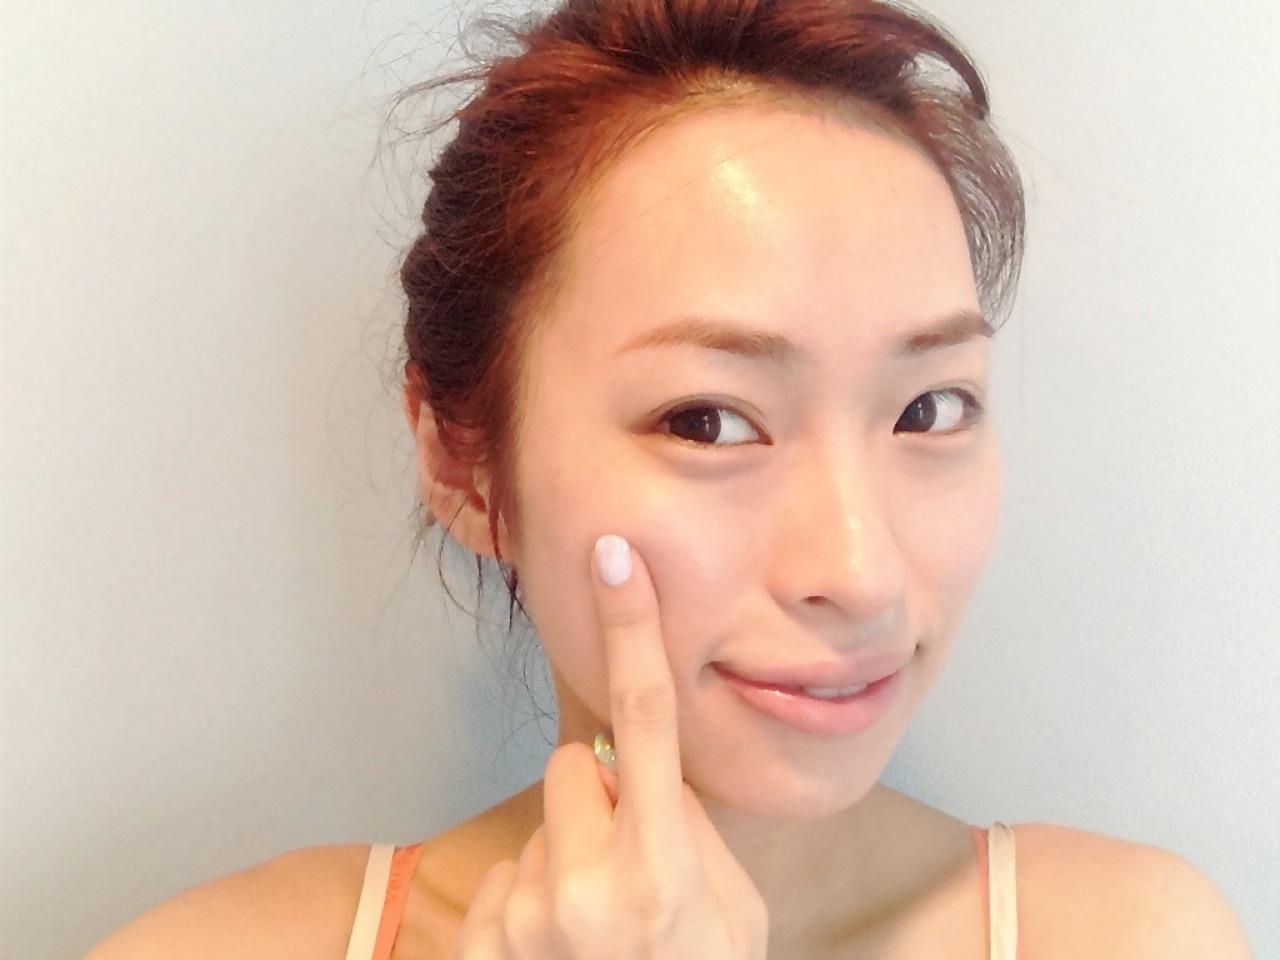 AKBパンチラとまん肉大島優子ポロリお宝エロ画像4枚目